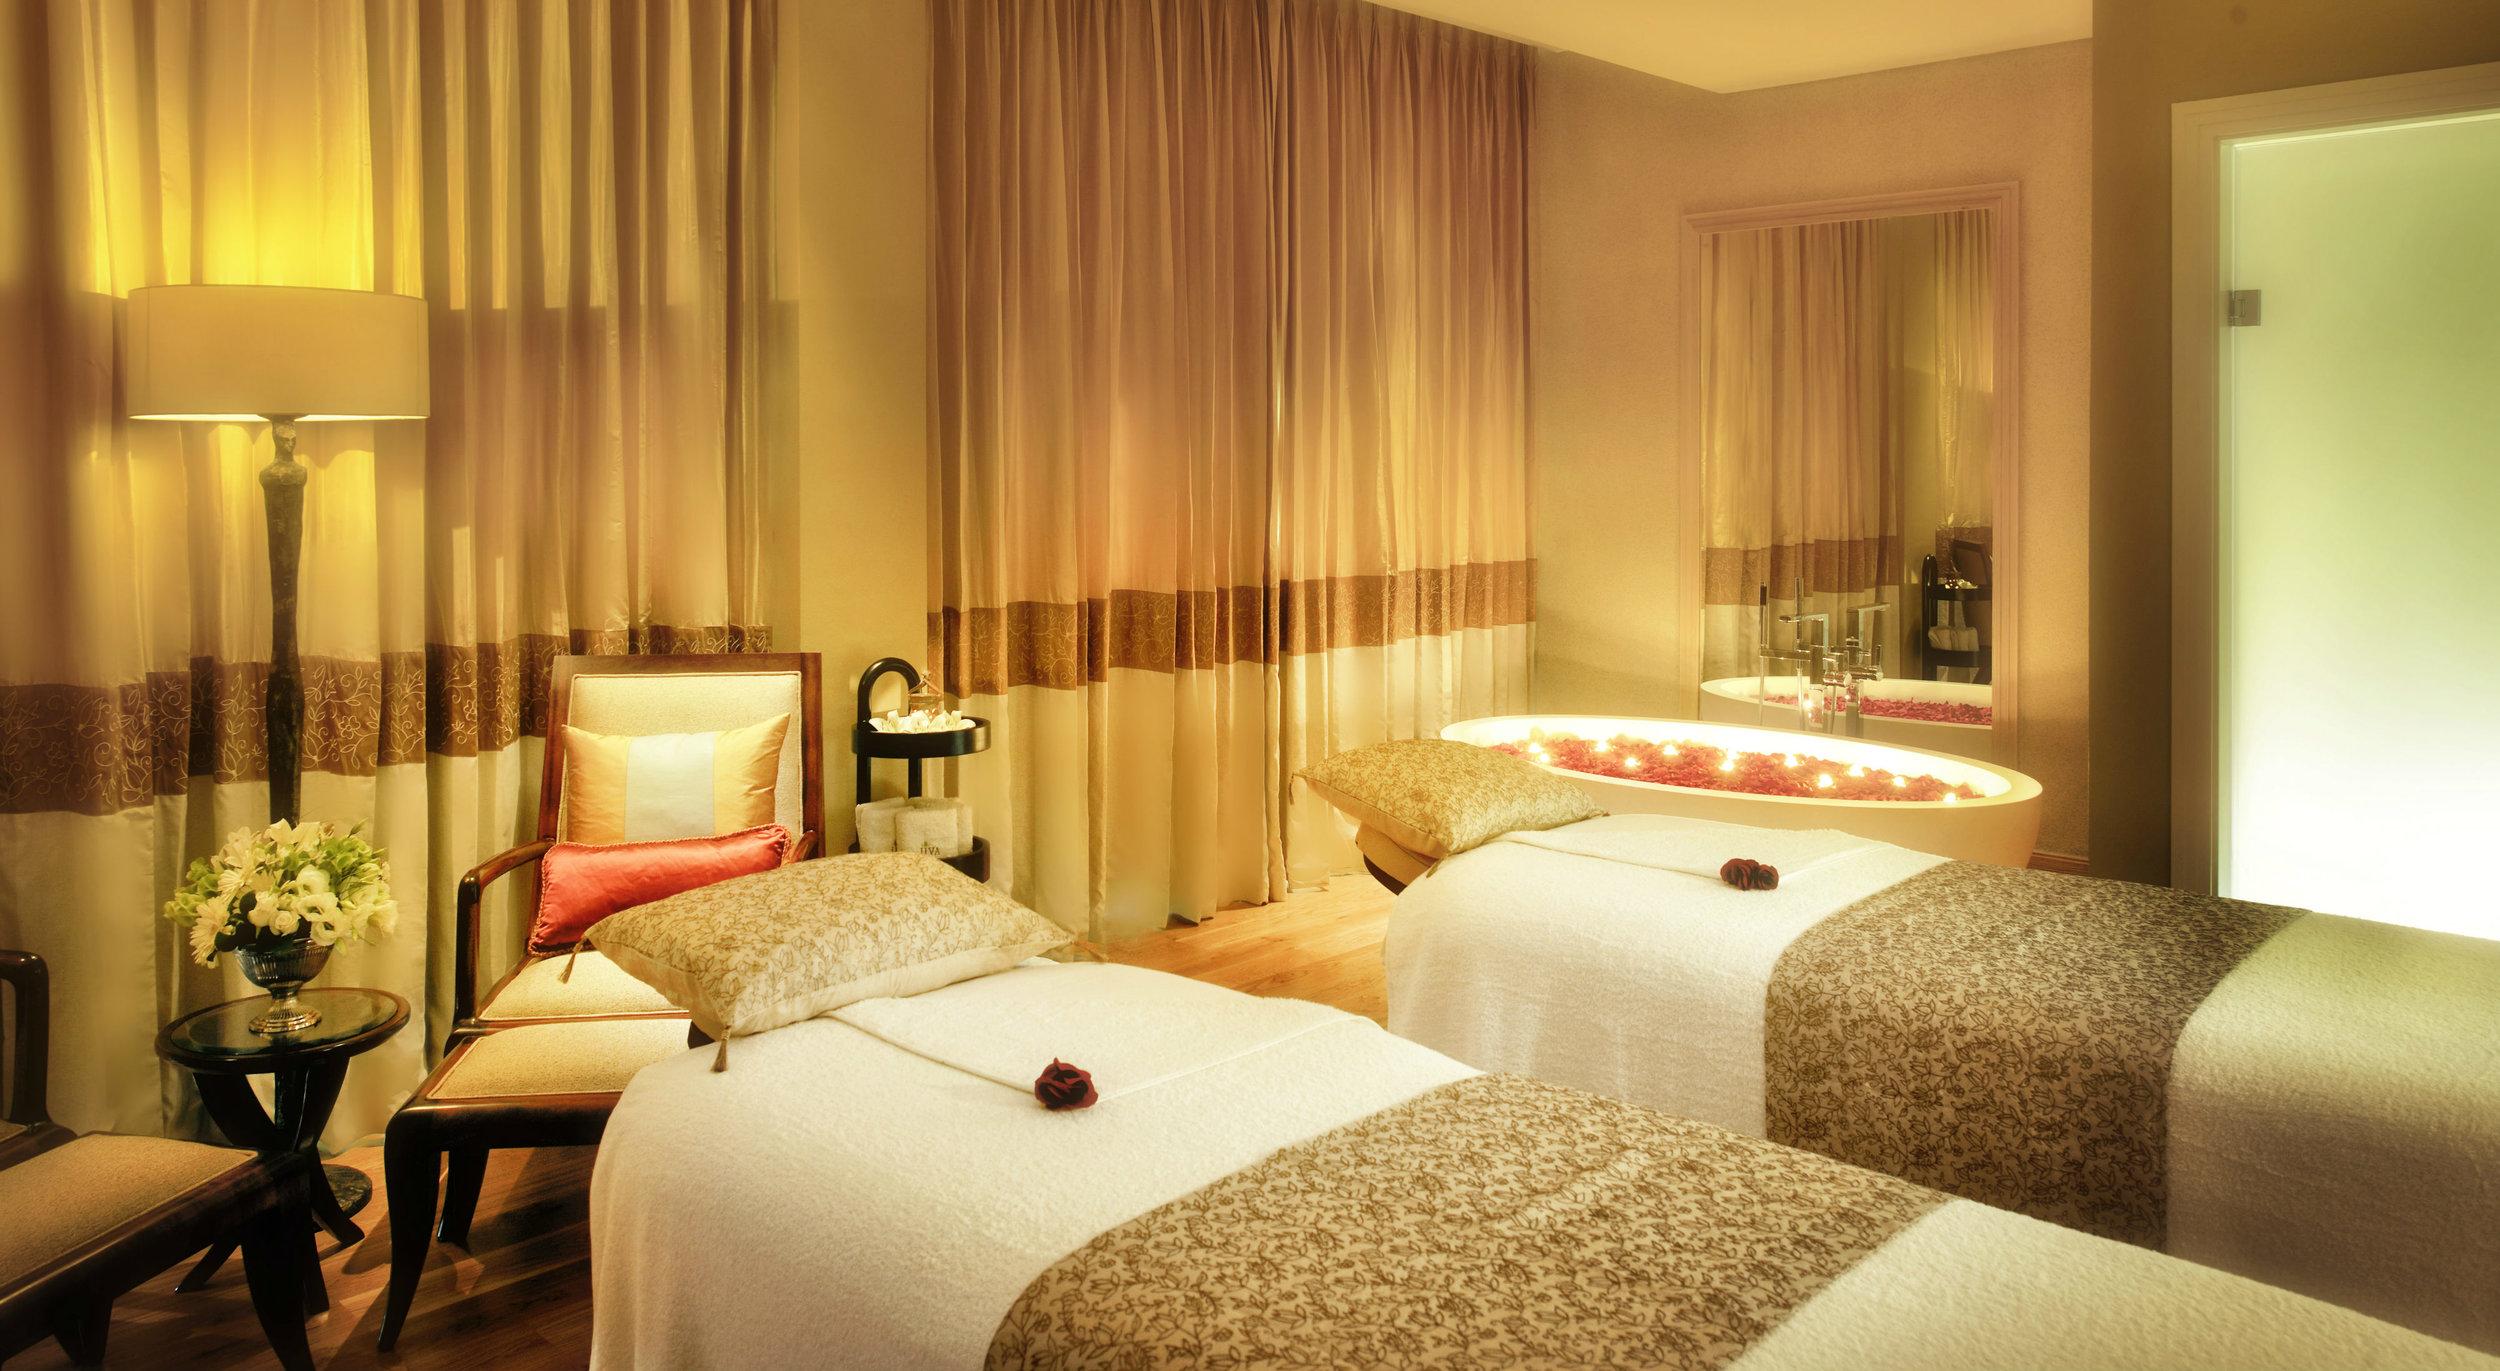 A treatment room inside the Taj Hotel Spa.